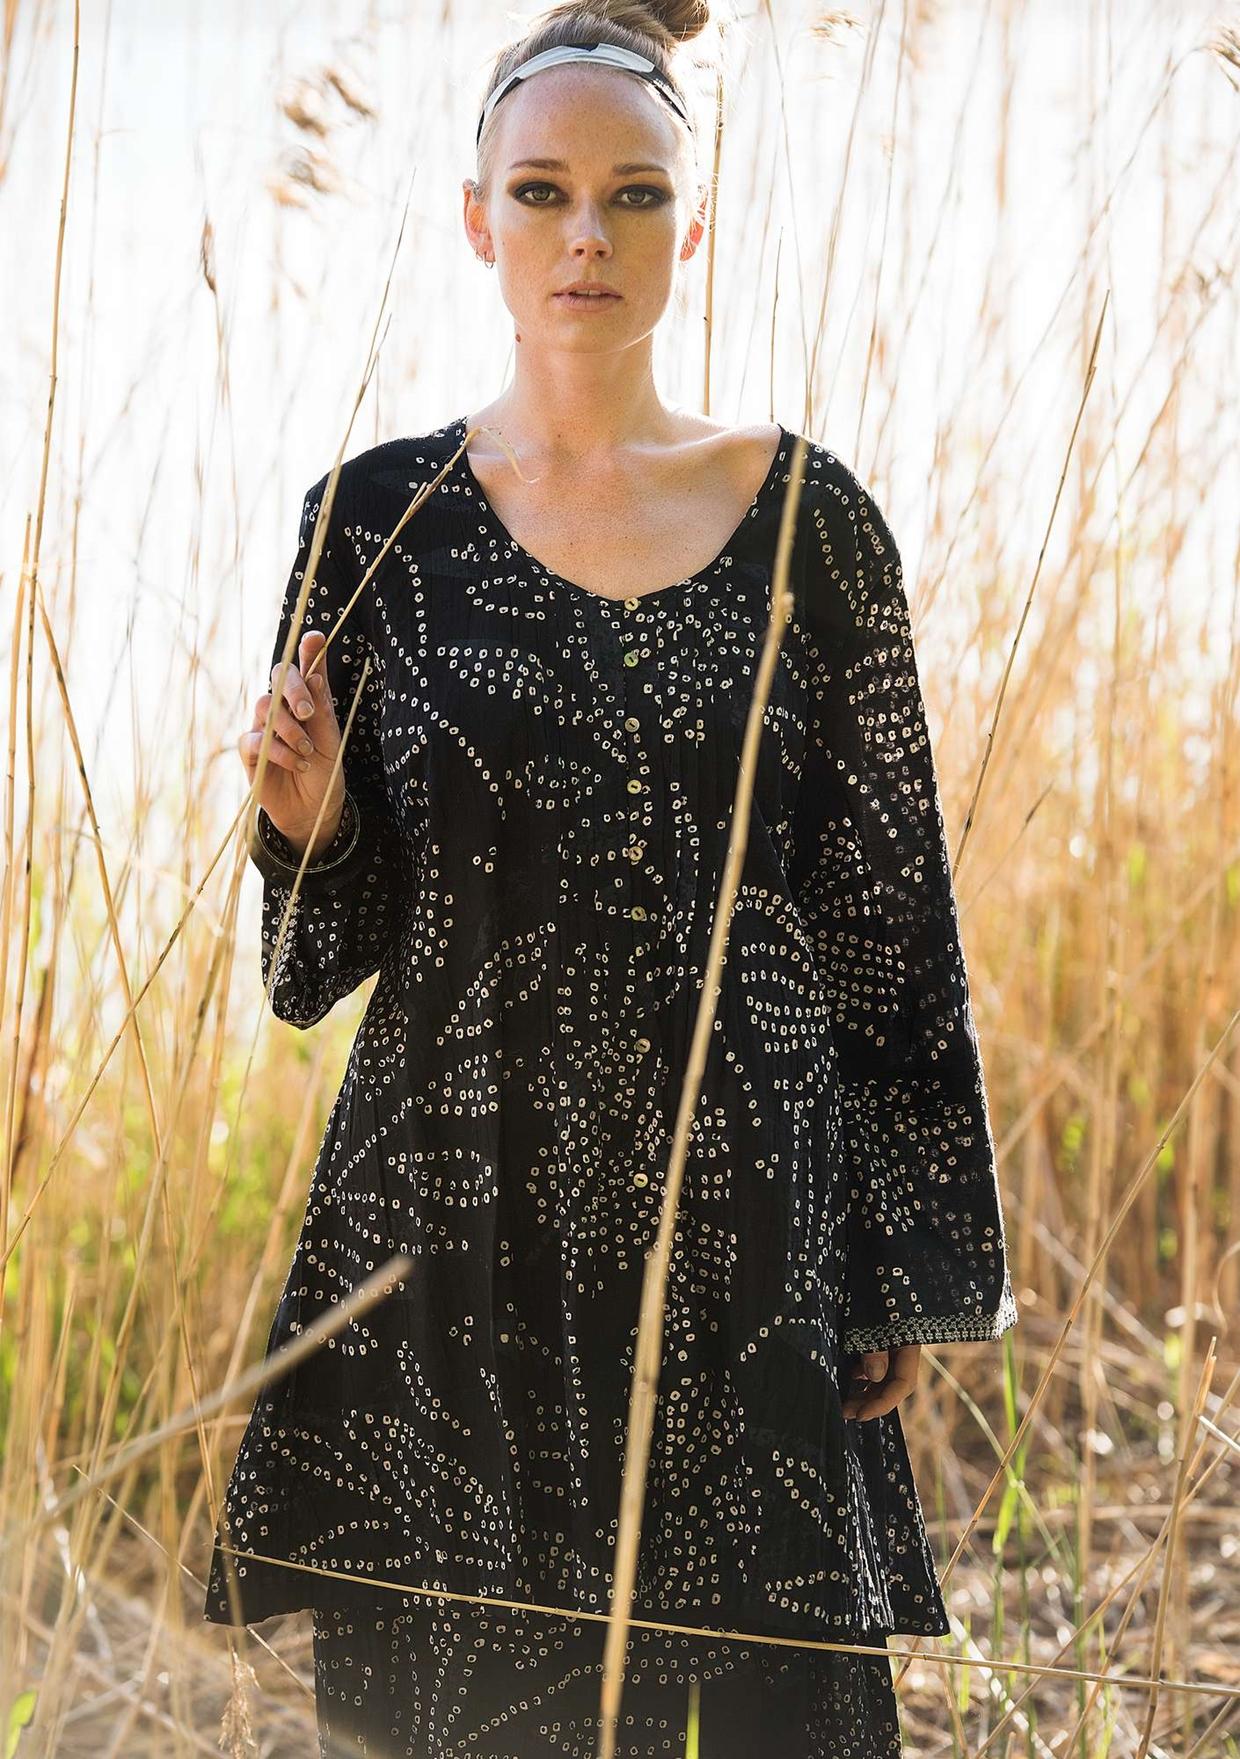 Mønstrete plagg i bomull, silke, lin og lyocell | Gudrun Sjödén